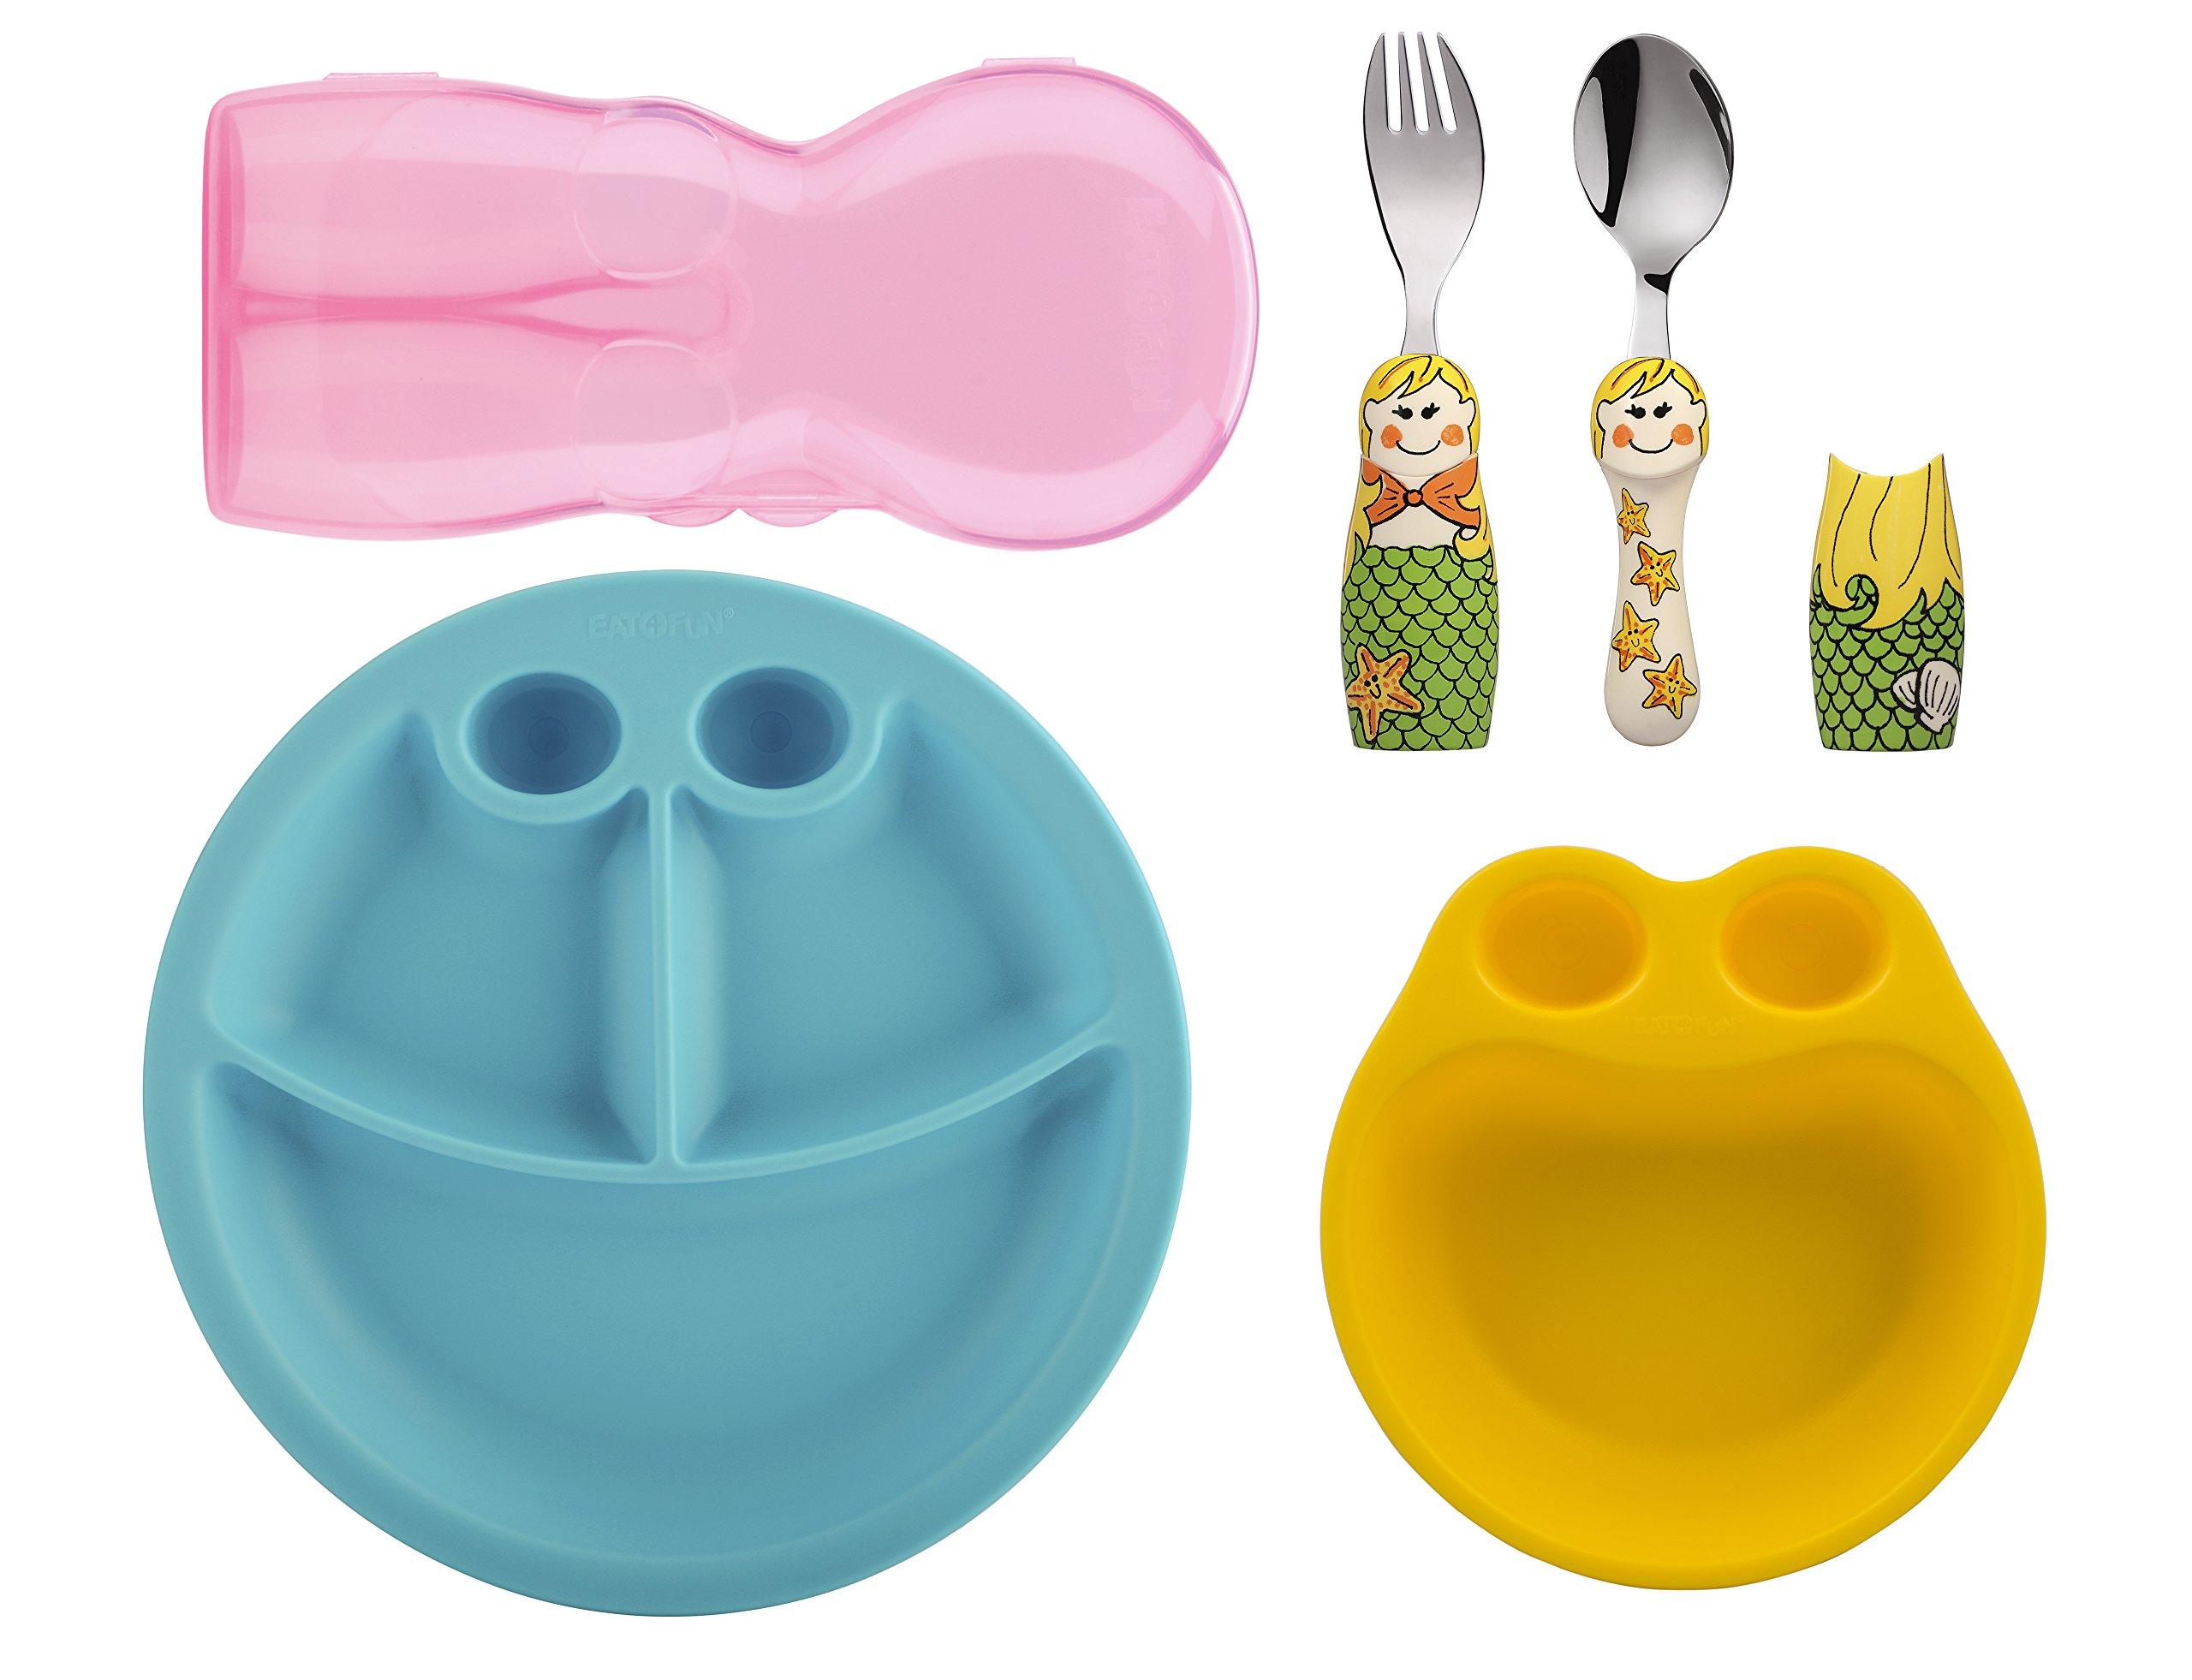 Eat4Fun Kids and Toddler Utensil Set - Mermaid Fork & Spoon Plate and Bowl by Eat4Fun (Image #1)